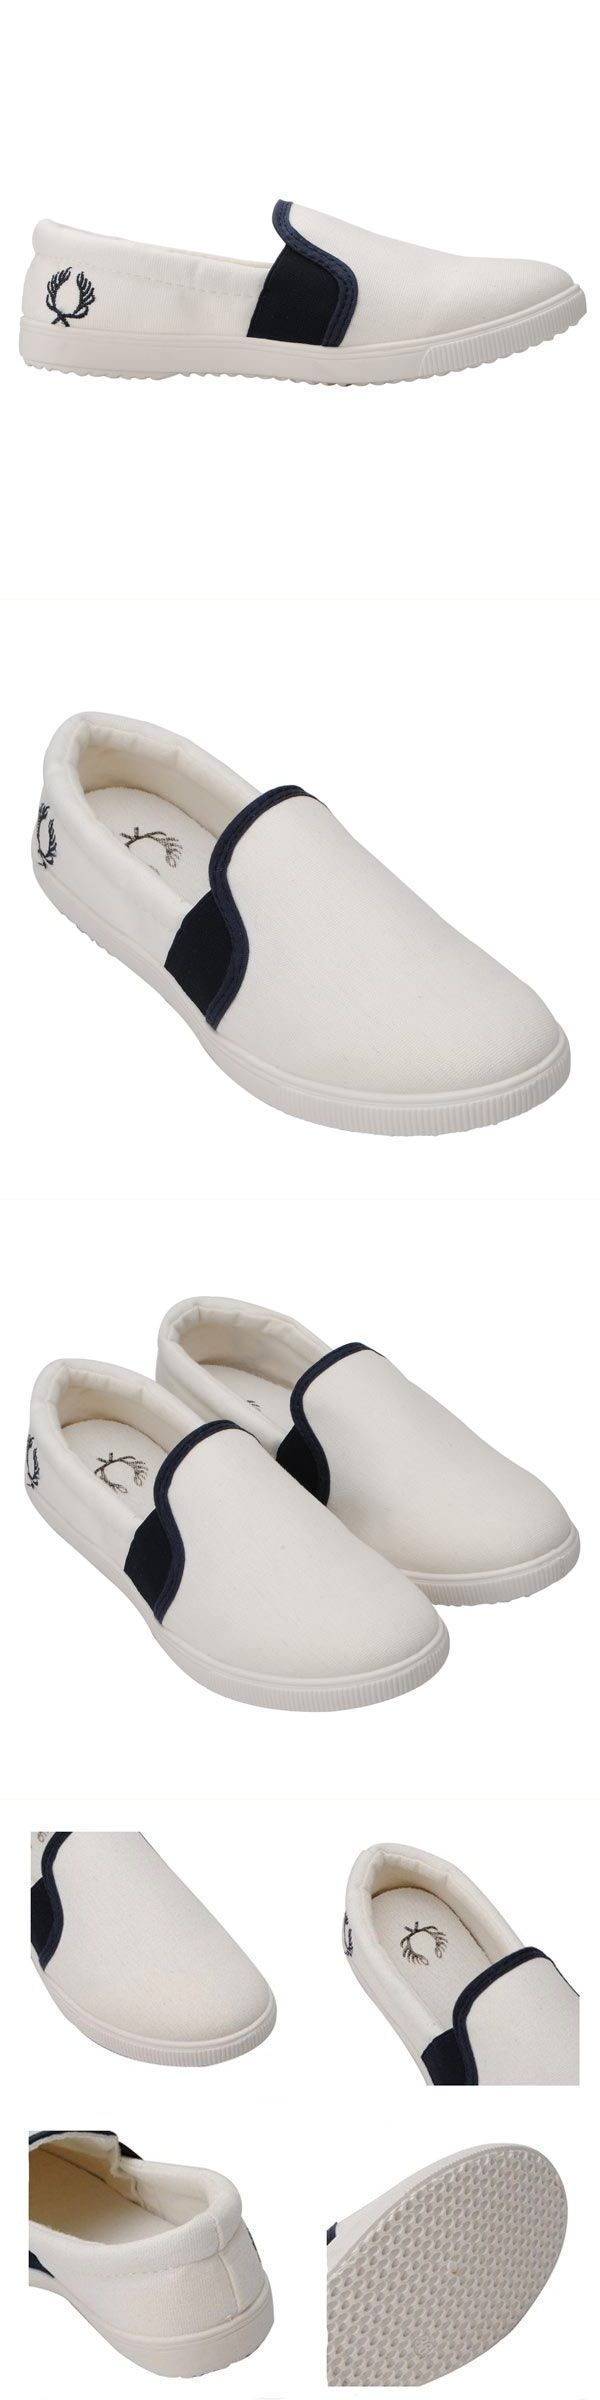 Loafers flat feet soft comfortable flat women canvas shoes #flat #loafers #mens #flat #shoe #nike #flat #shoe #quotes #flat #shoe #styles #2015